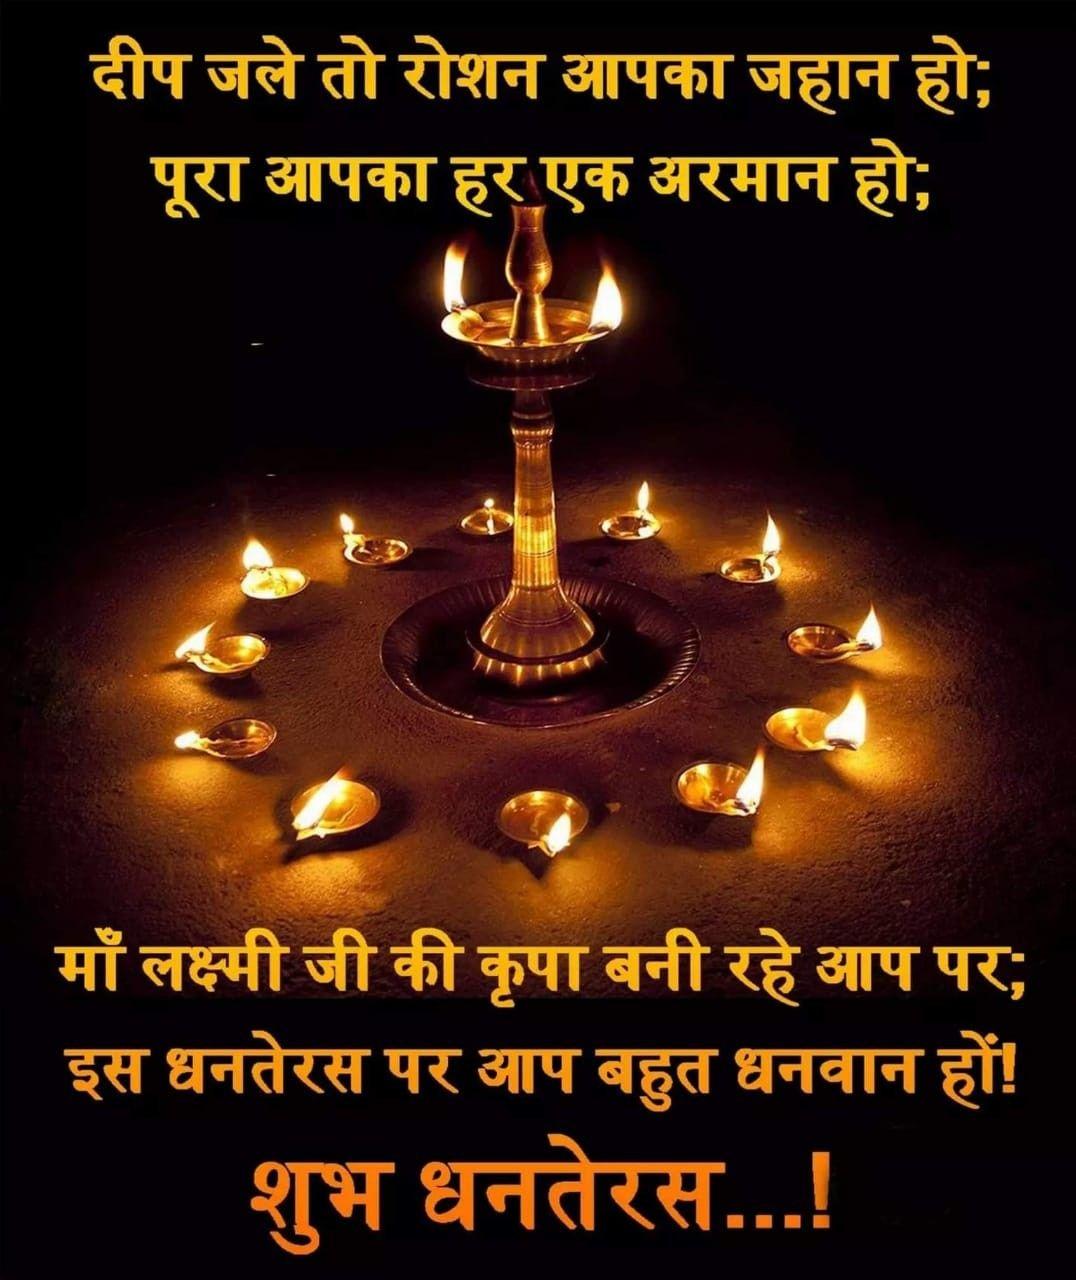 Pin by Narendra Pal Singh on Dhanteras Happy dhanteras